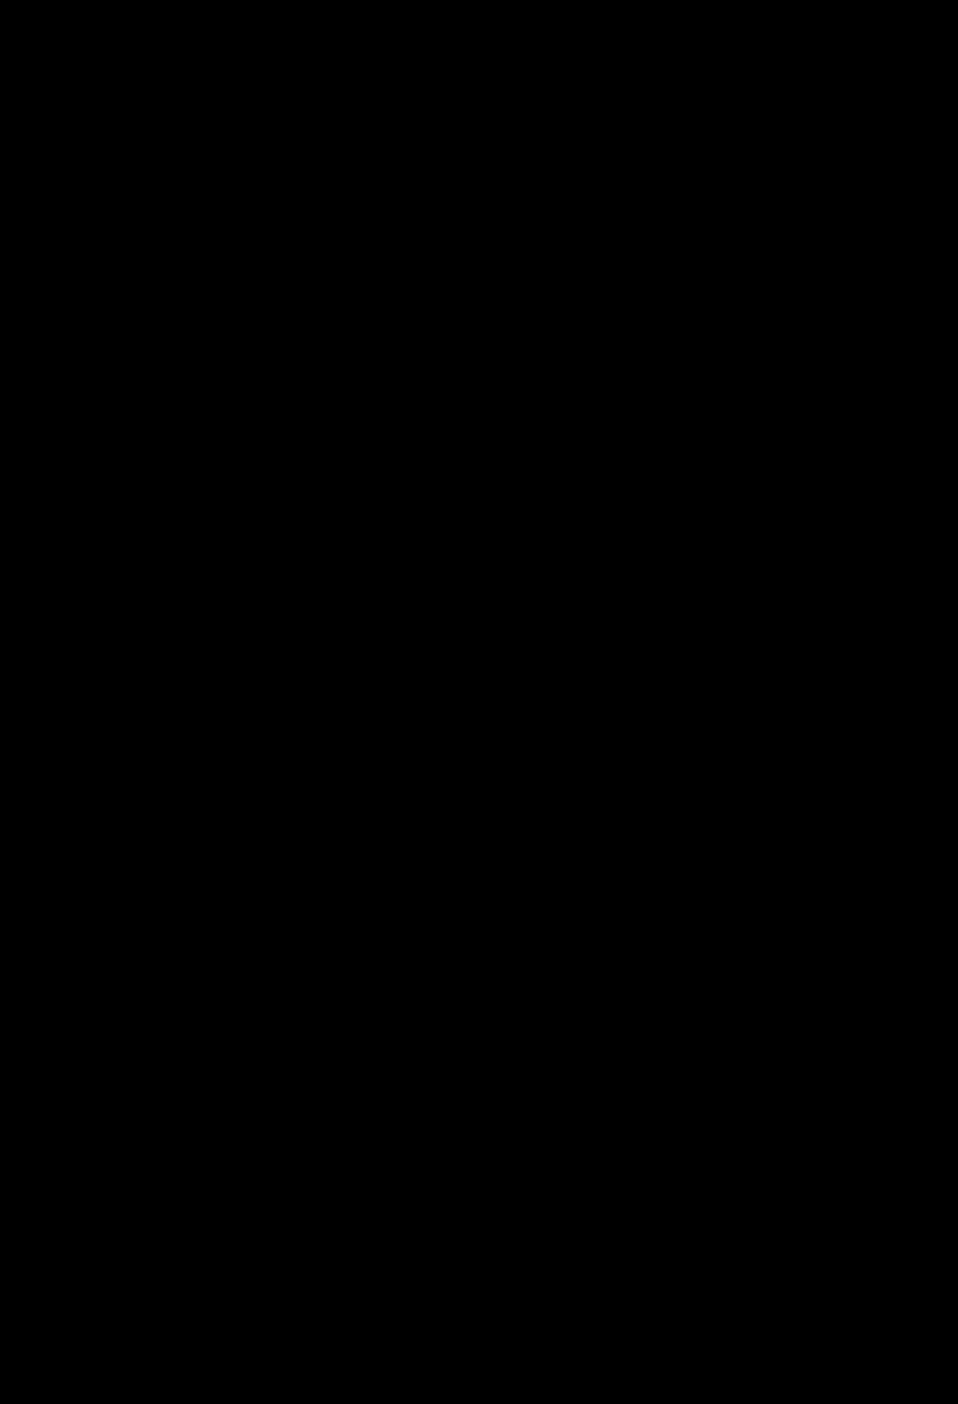 Free arrow clipart black white banner free download Arrows Black | Free Stock Photo | Illustration of a crooked black up ... banner free download